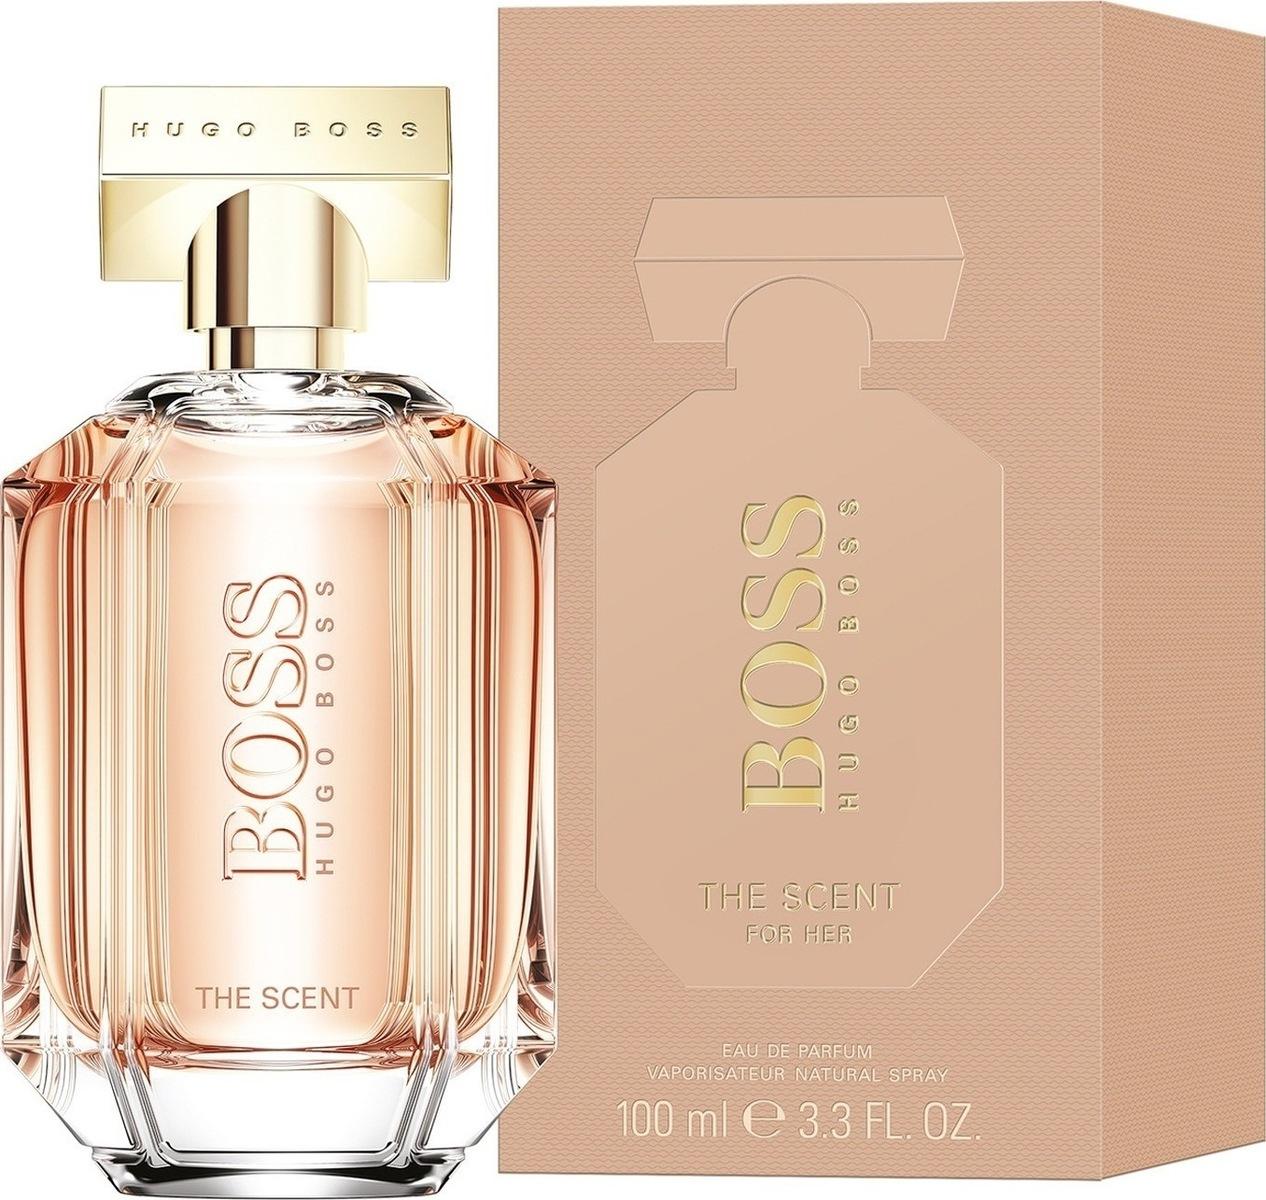 Hugo Boss The Scent for Her, Parfémovaná voda, 100ml, Dámska vôňa, + AKCE: dárek zdarma